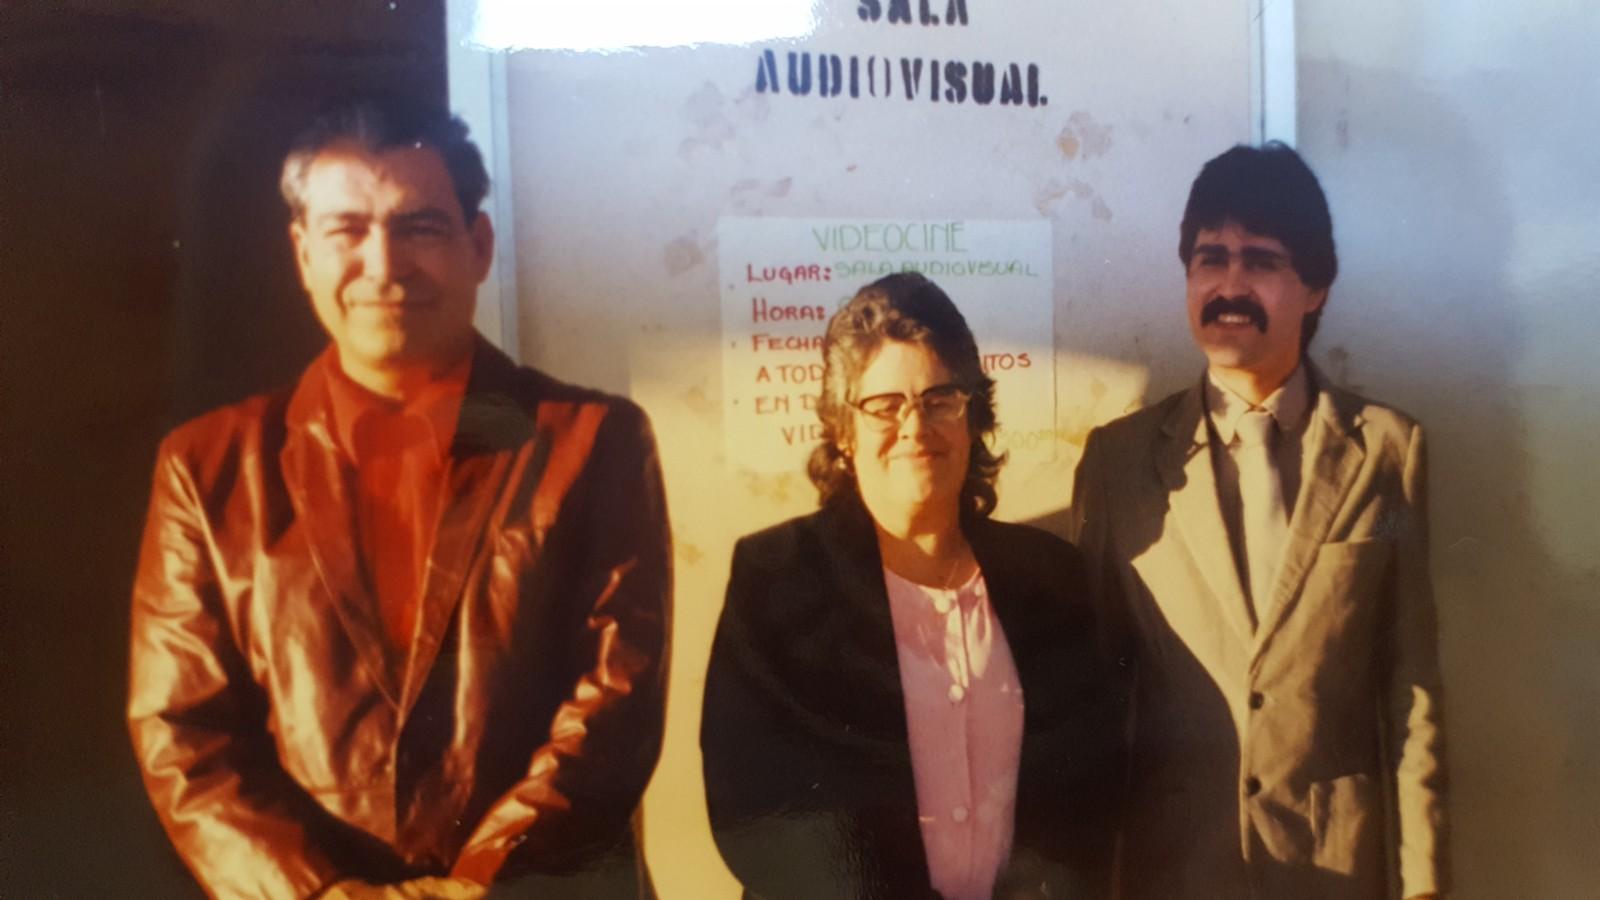 Family photo of Jose Orozco, Aurora Orozco, and David Orozco.